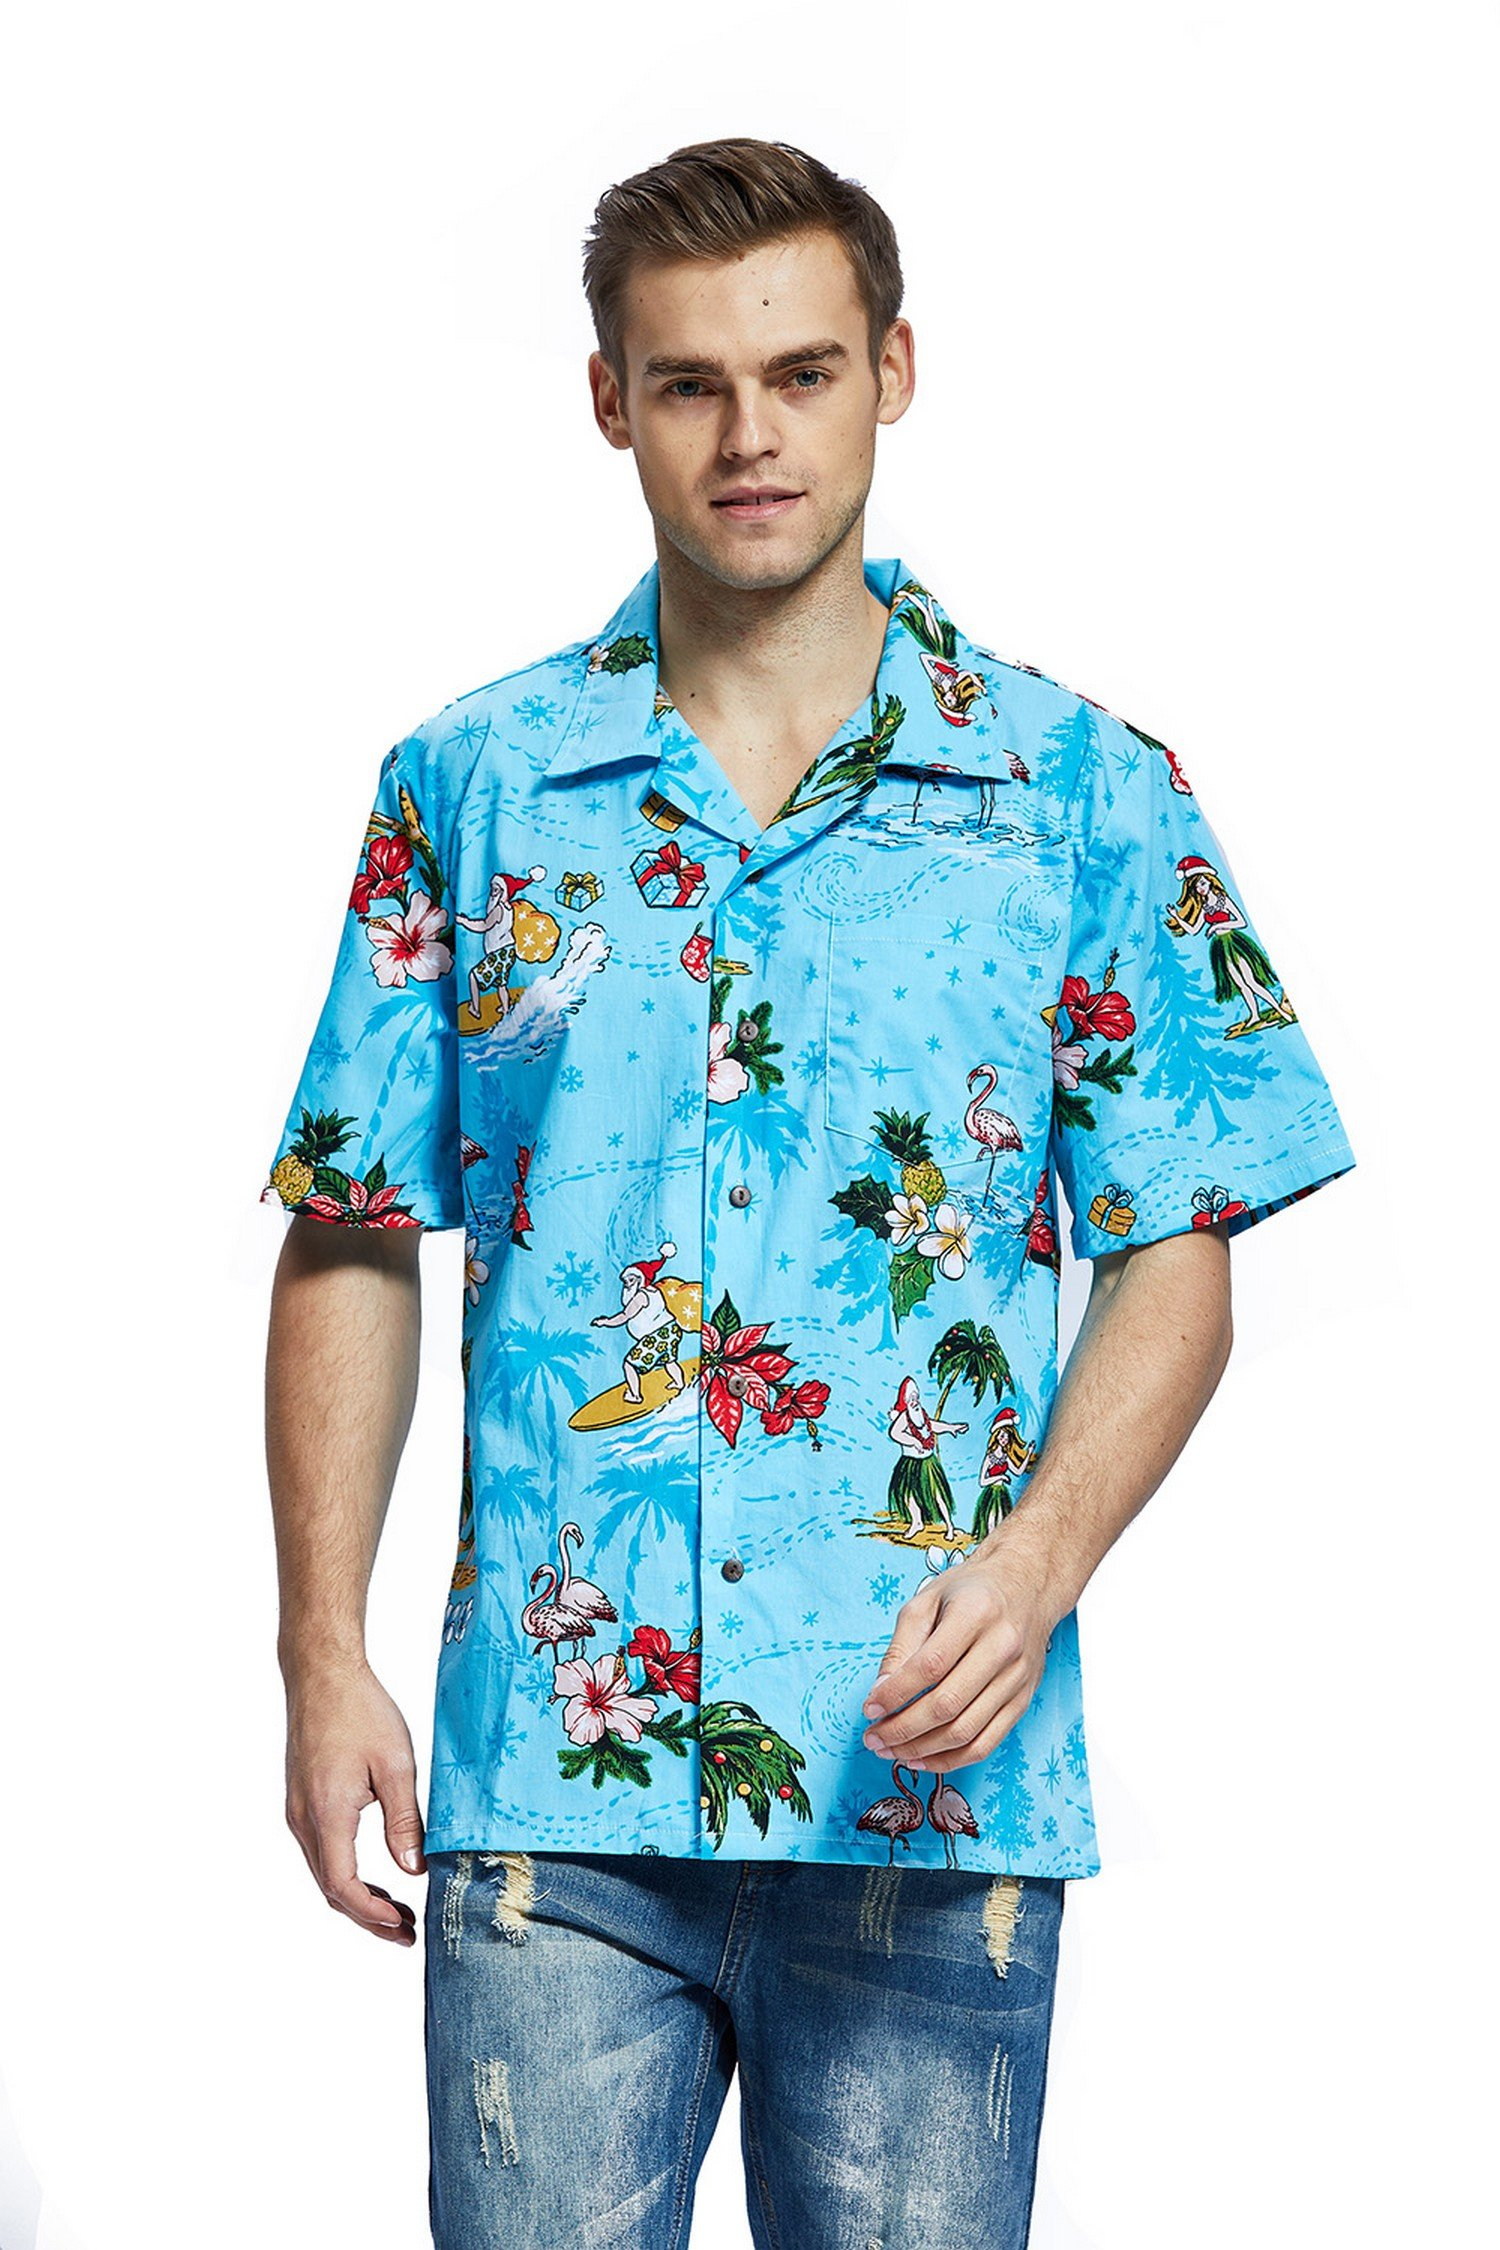 Hawaii Hangover Men's Hawaiian Shirt Aloha Shirt Christmas Shirt Santa